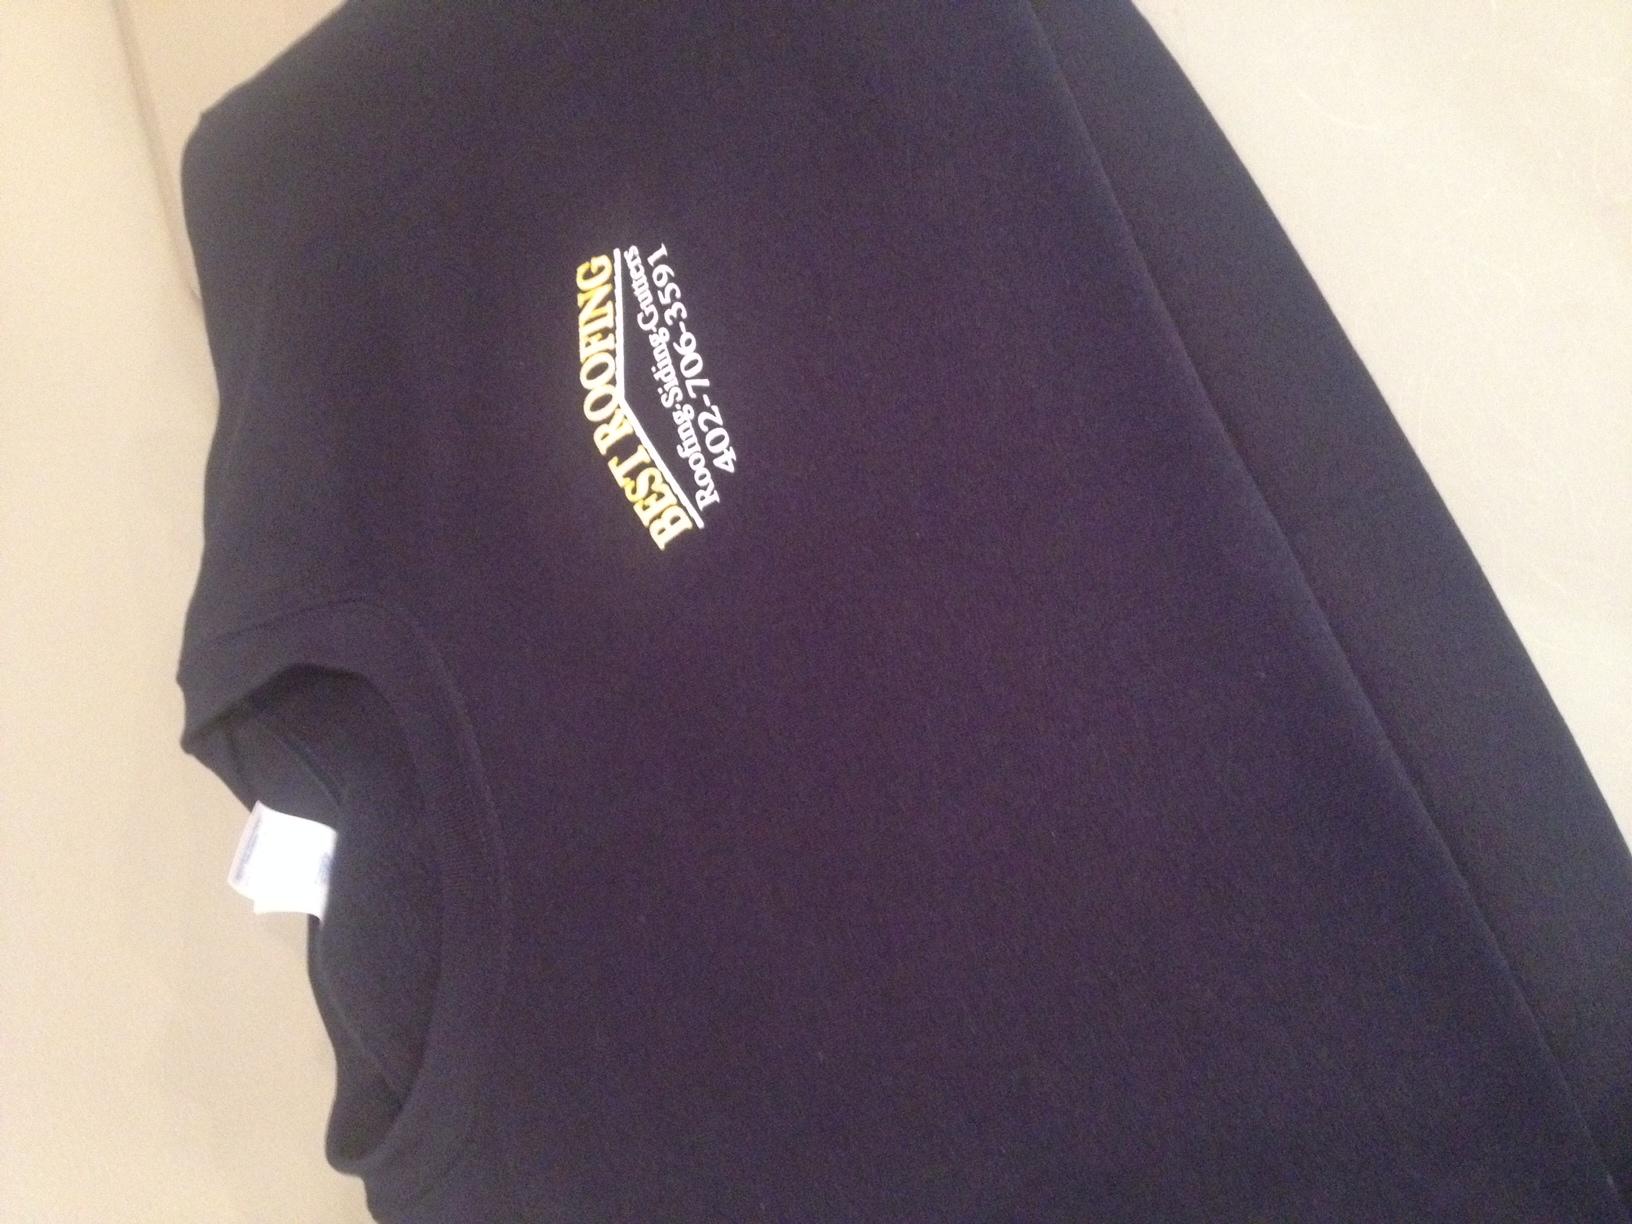 Crewneck sweatshirts for Best Roofing